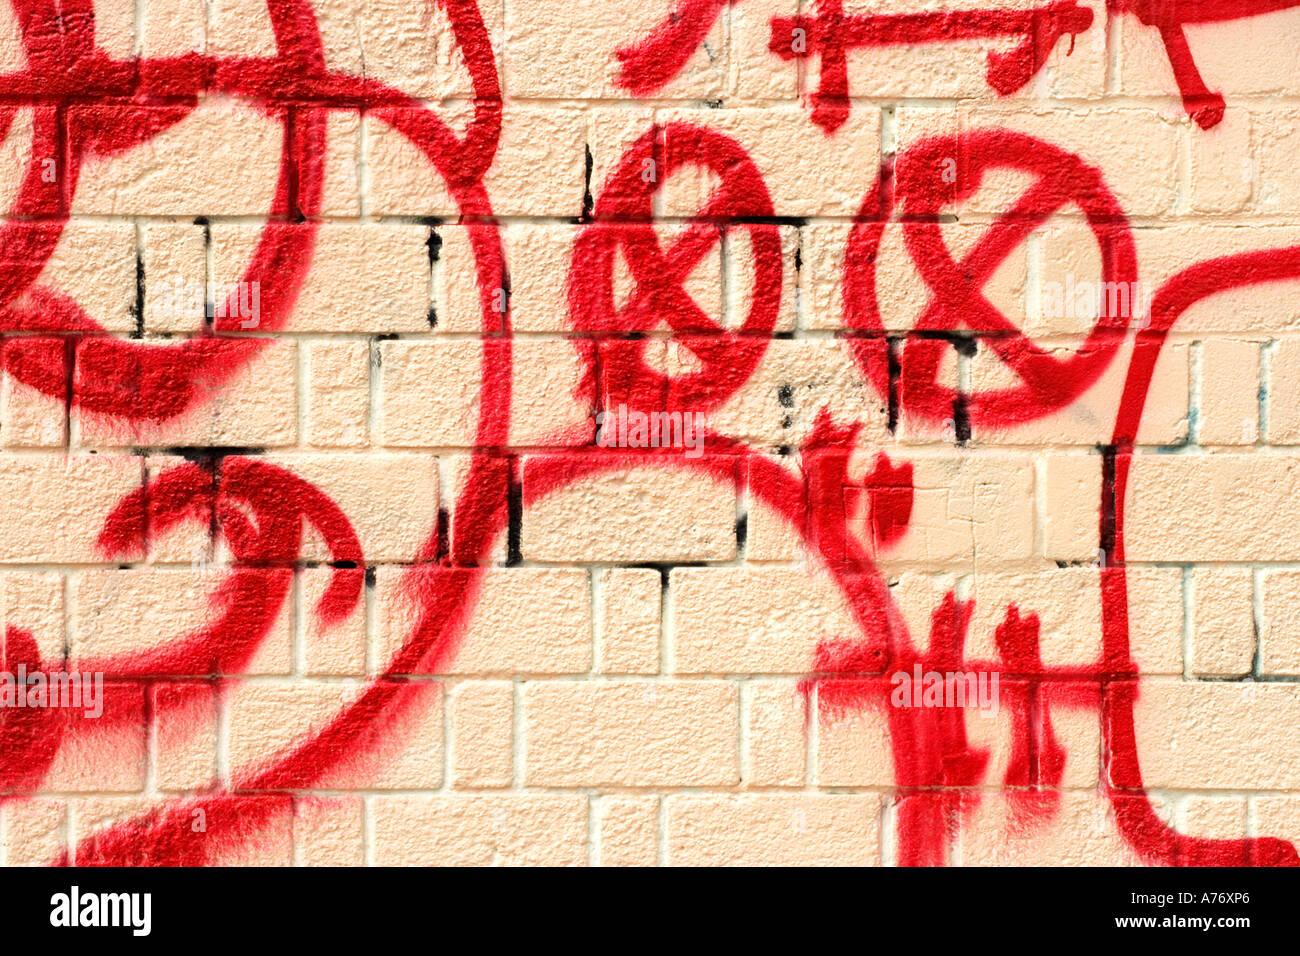 Grafiti wall red - Stock Photo Wall Painting White Red Brick Wall Red Paint On Tan Wall Street Art Graffiti